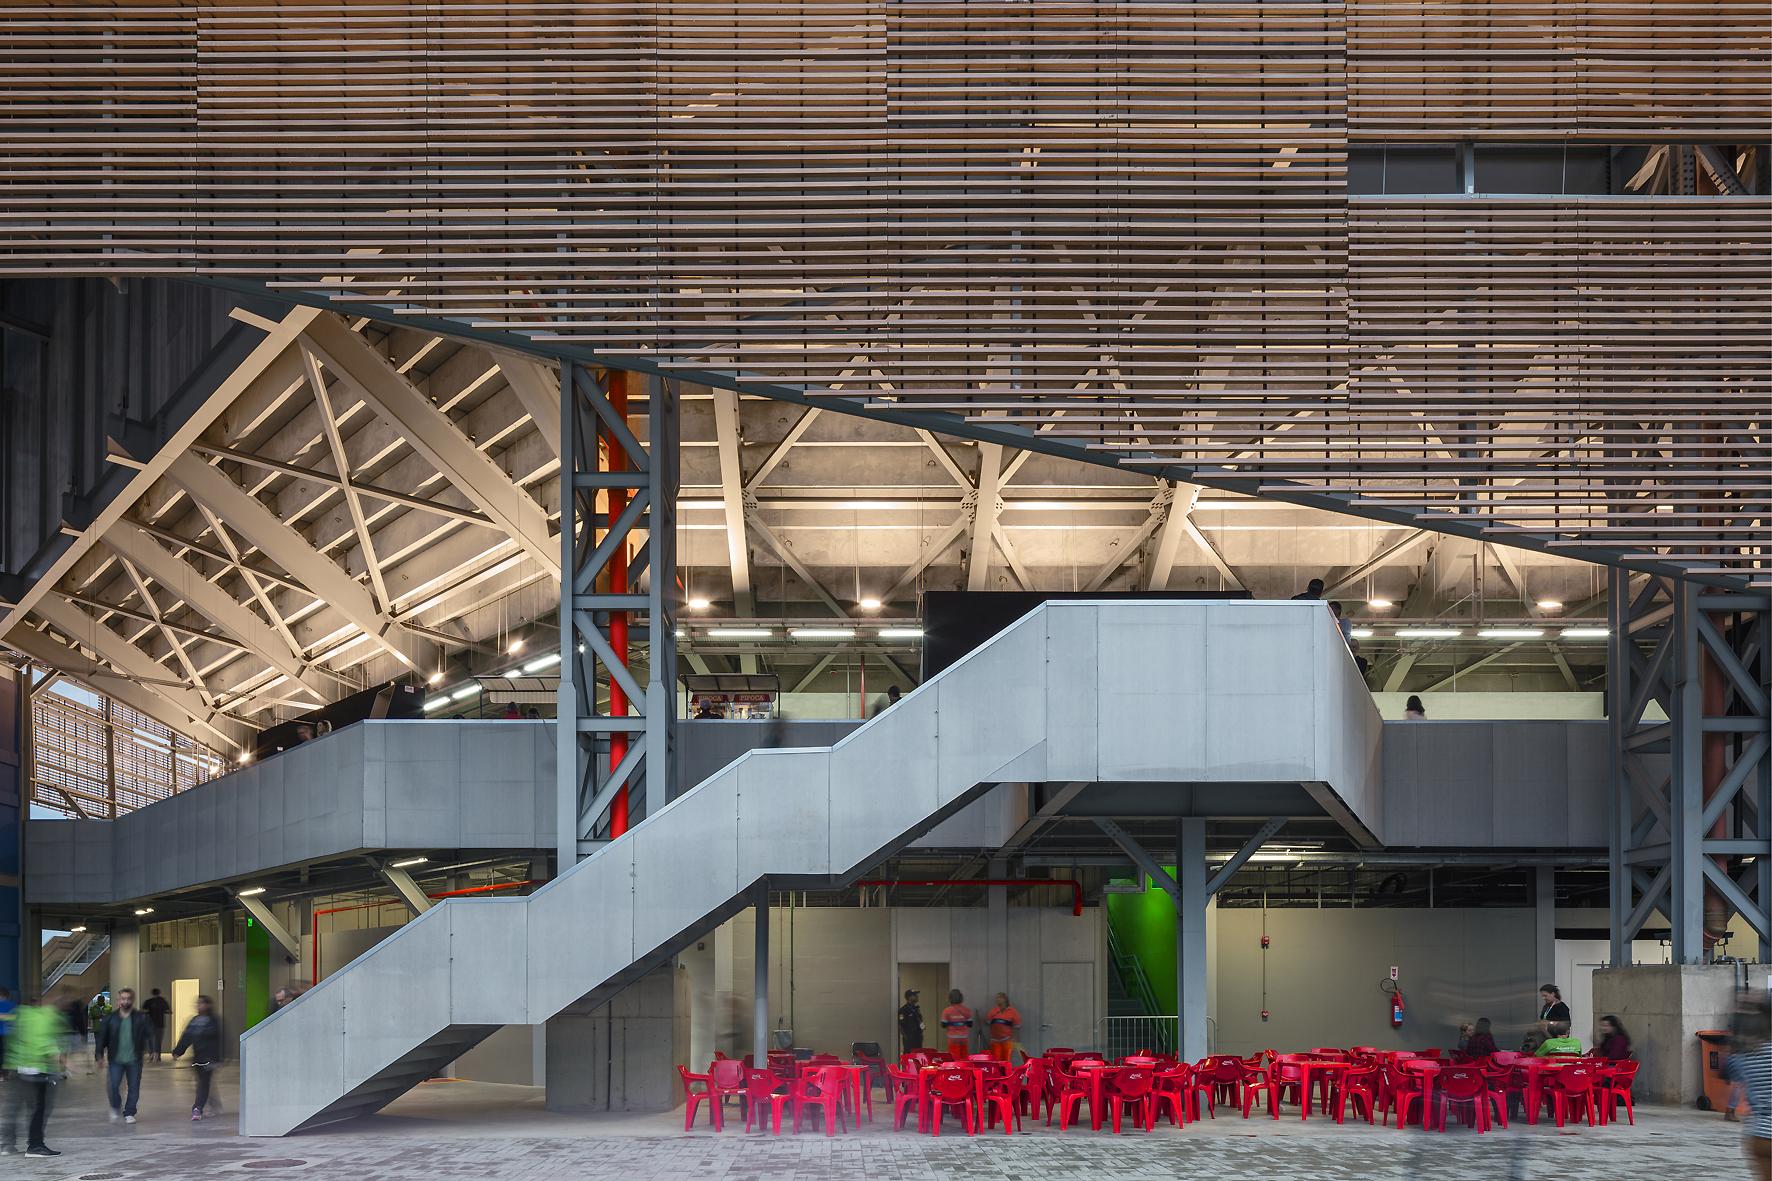 Rio 2016 Olympic Handball Arena